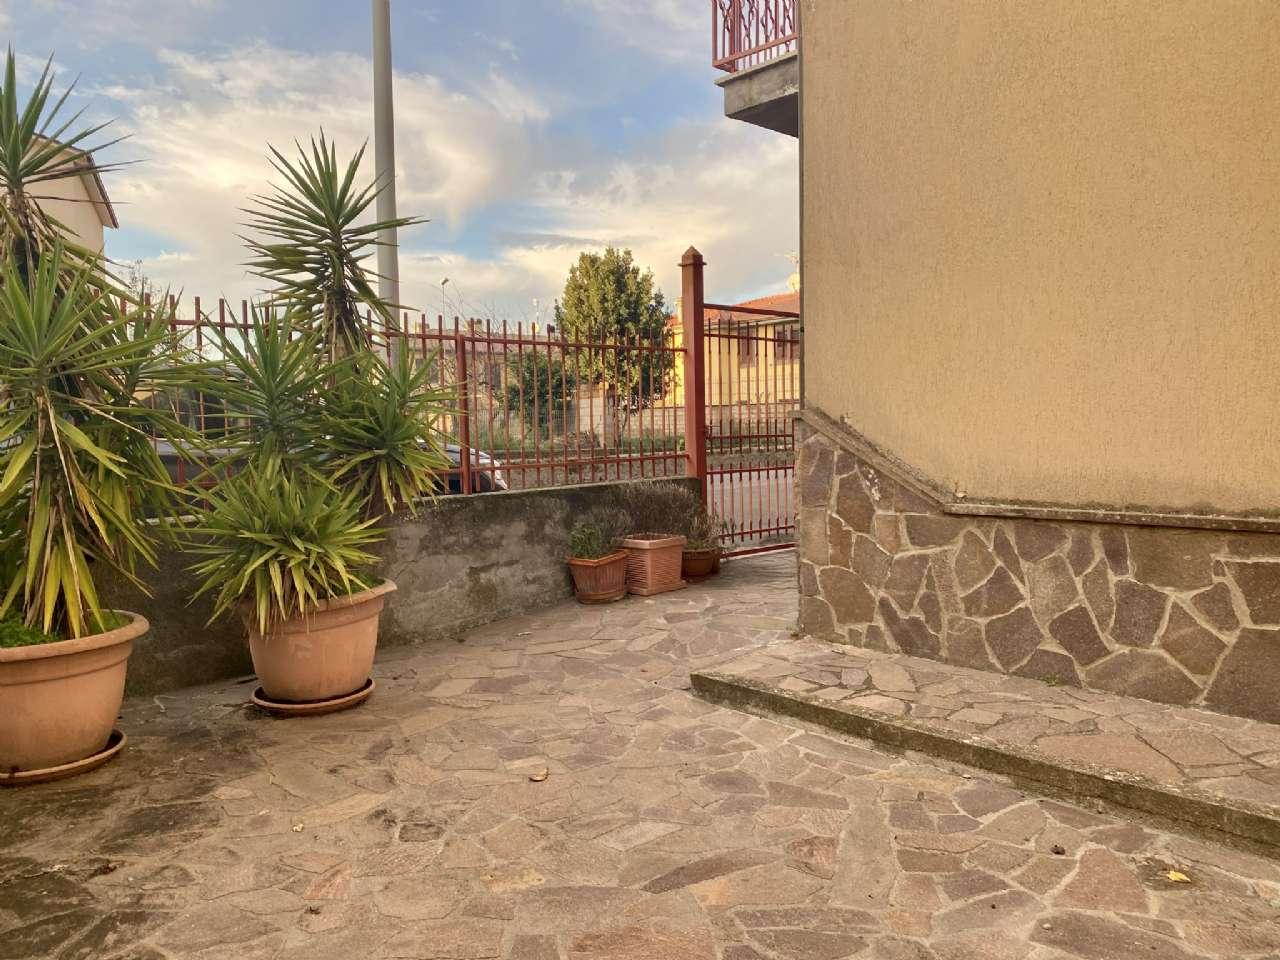 Quadrilocale, Via Umberto Giordano, Tuscania, foto 16